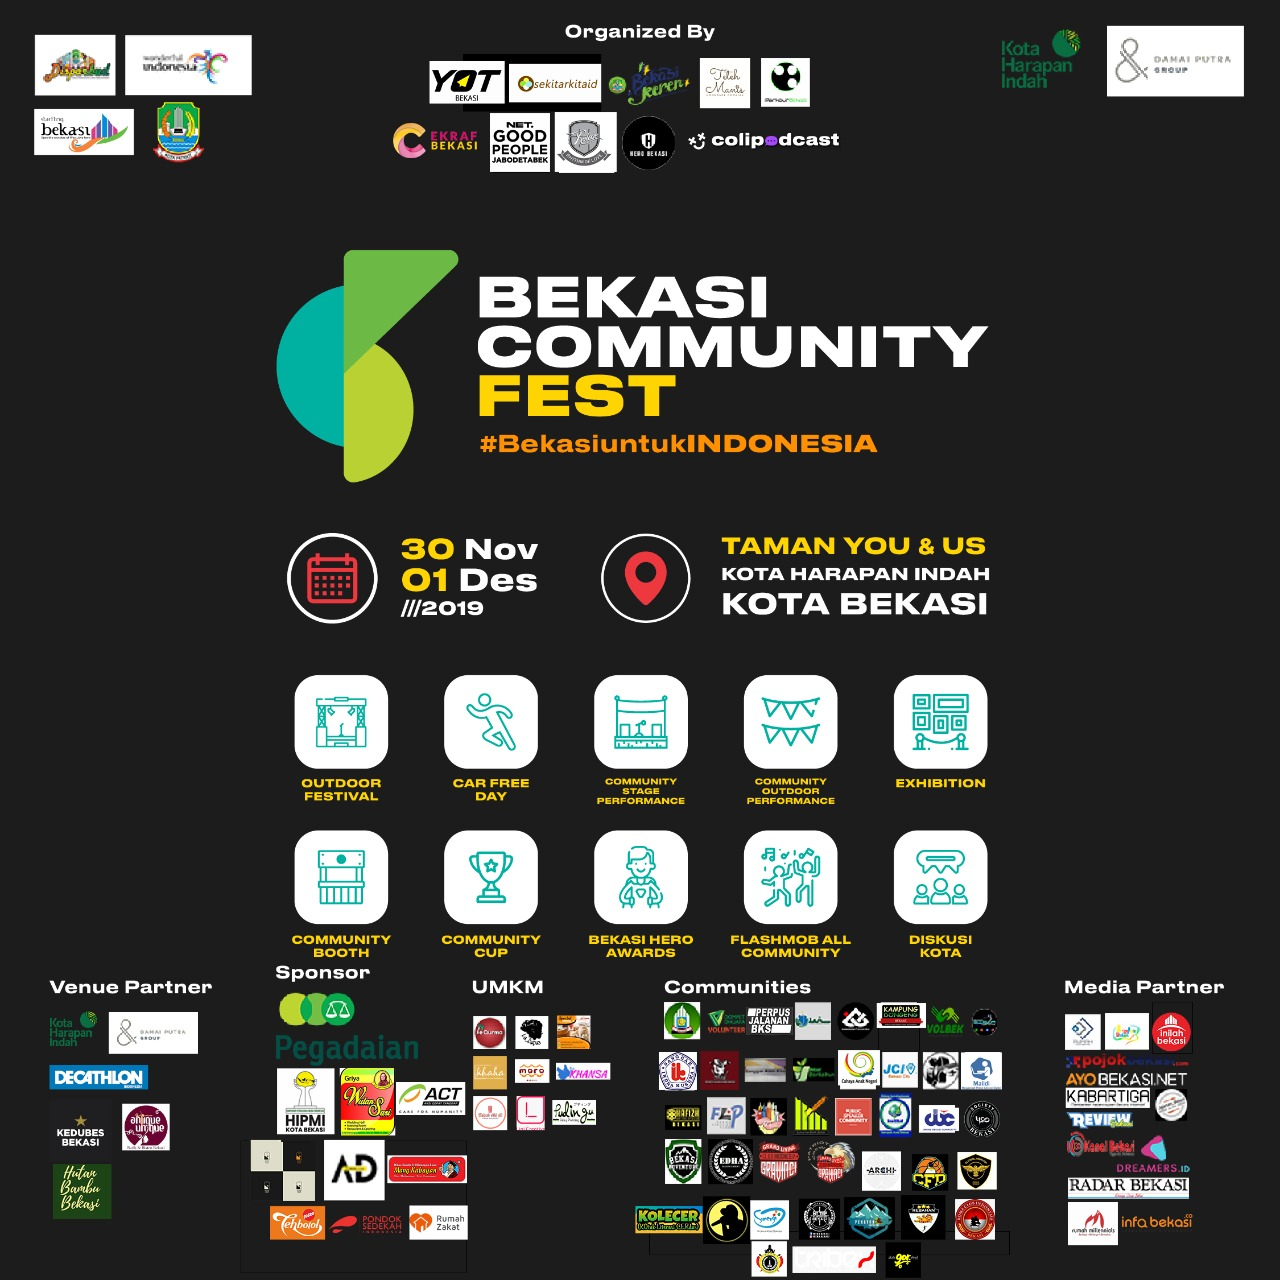 Bekasi Community Fest